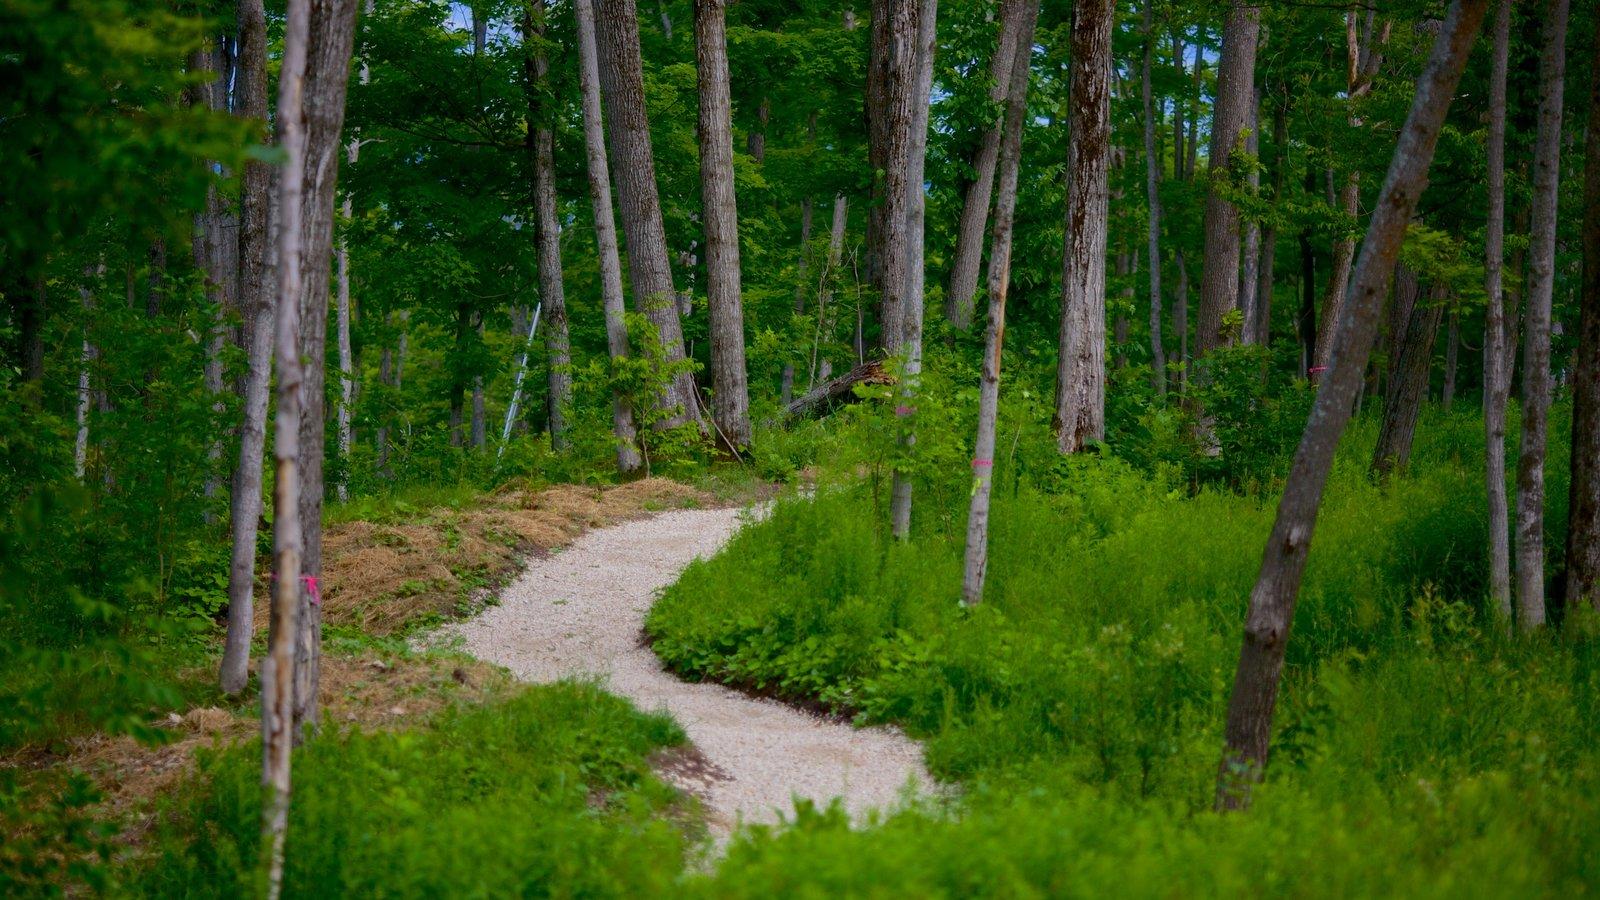 Blue Mountains que inclui florestas